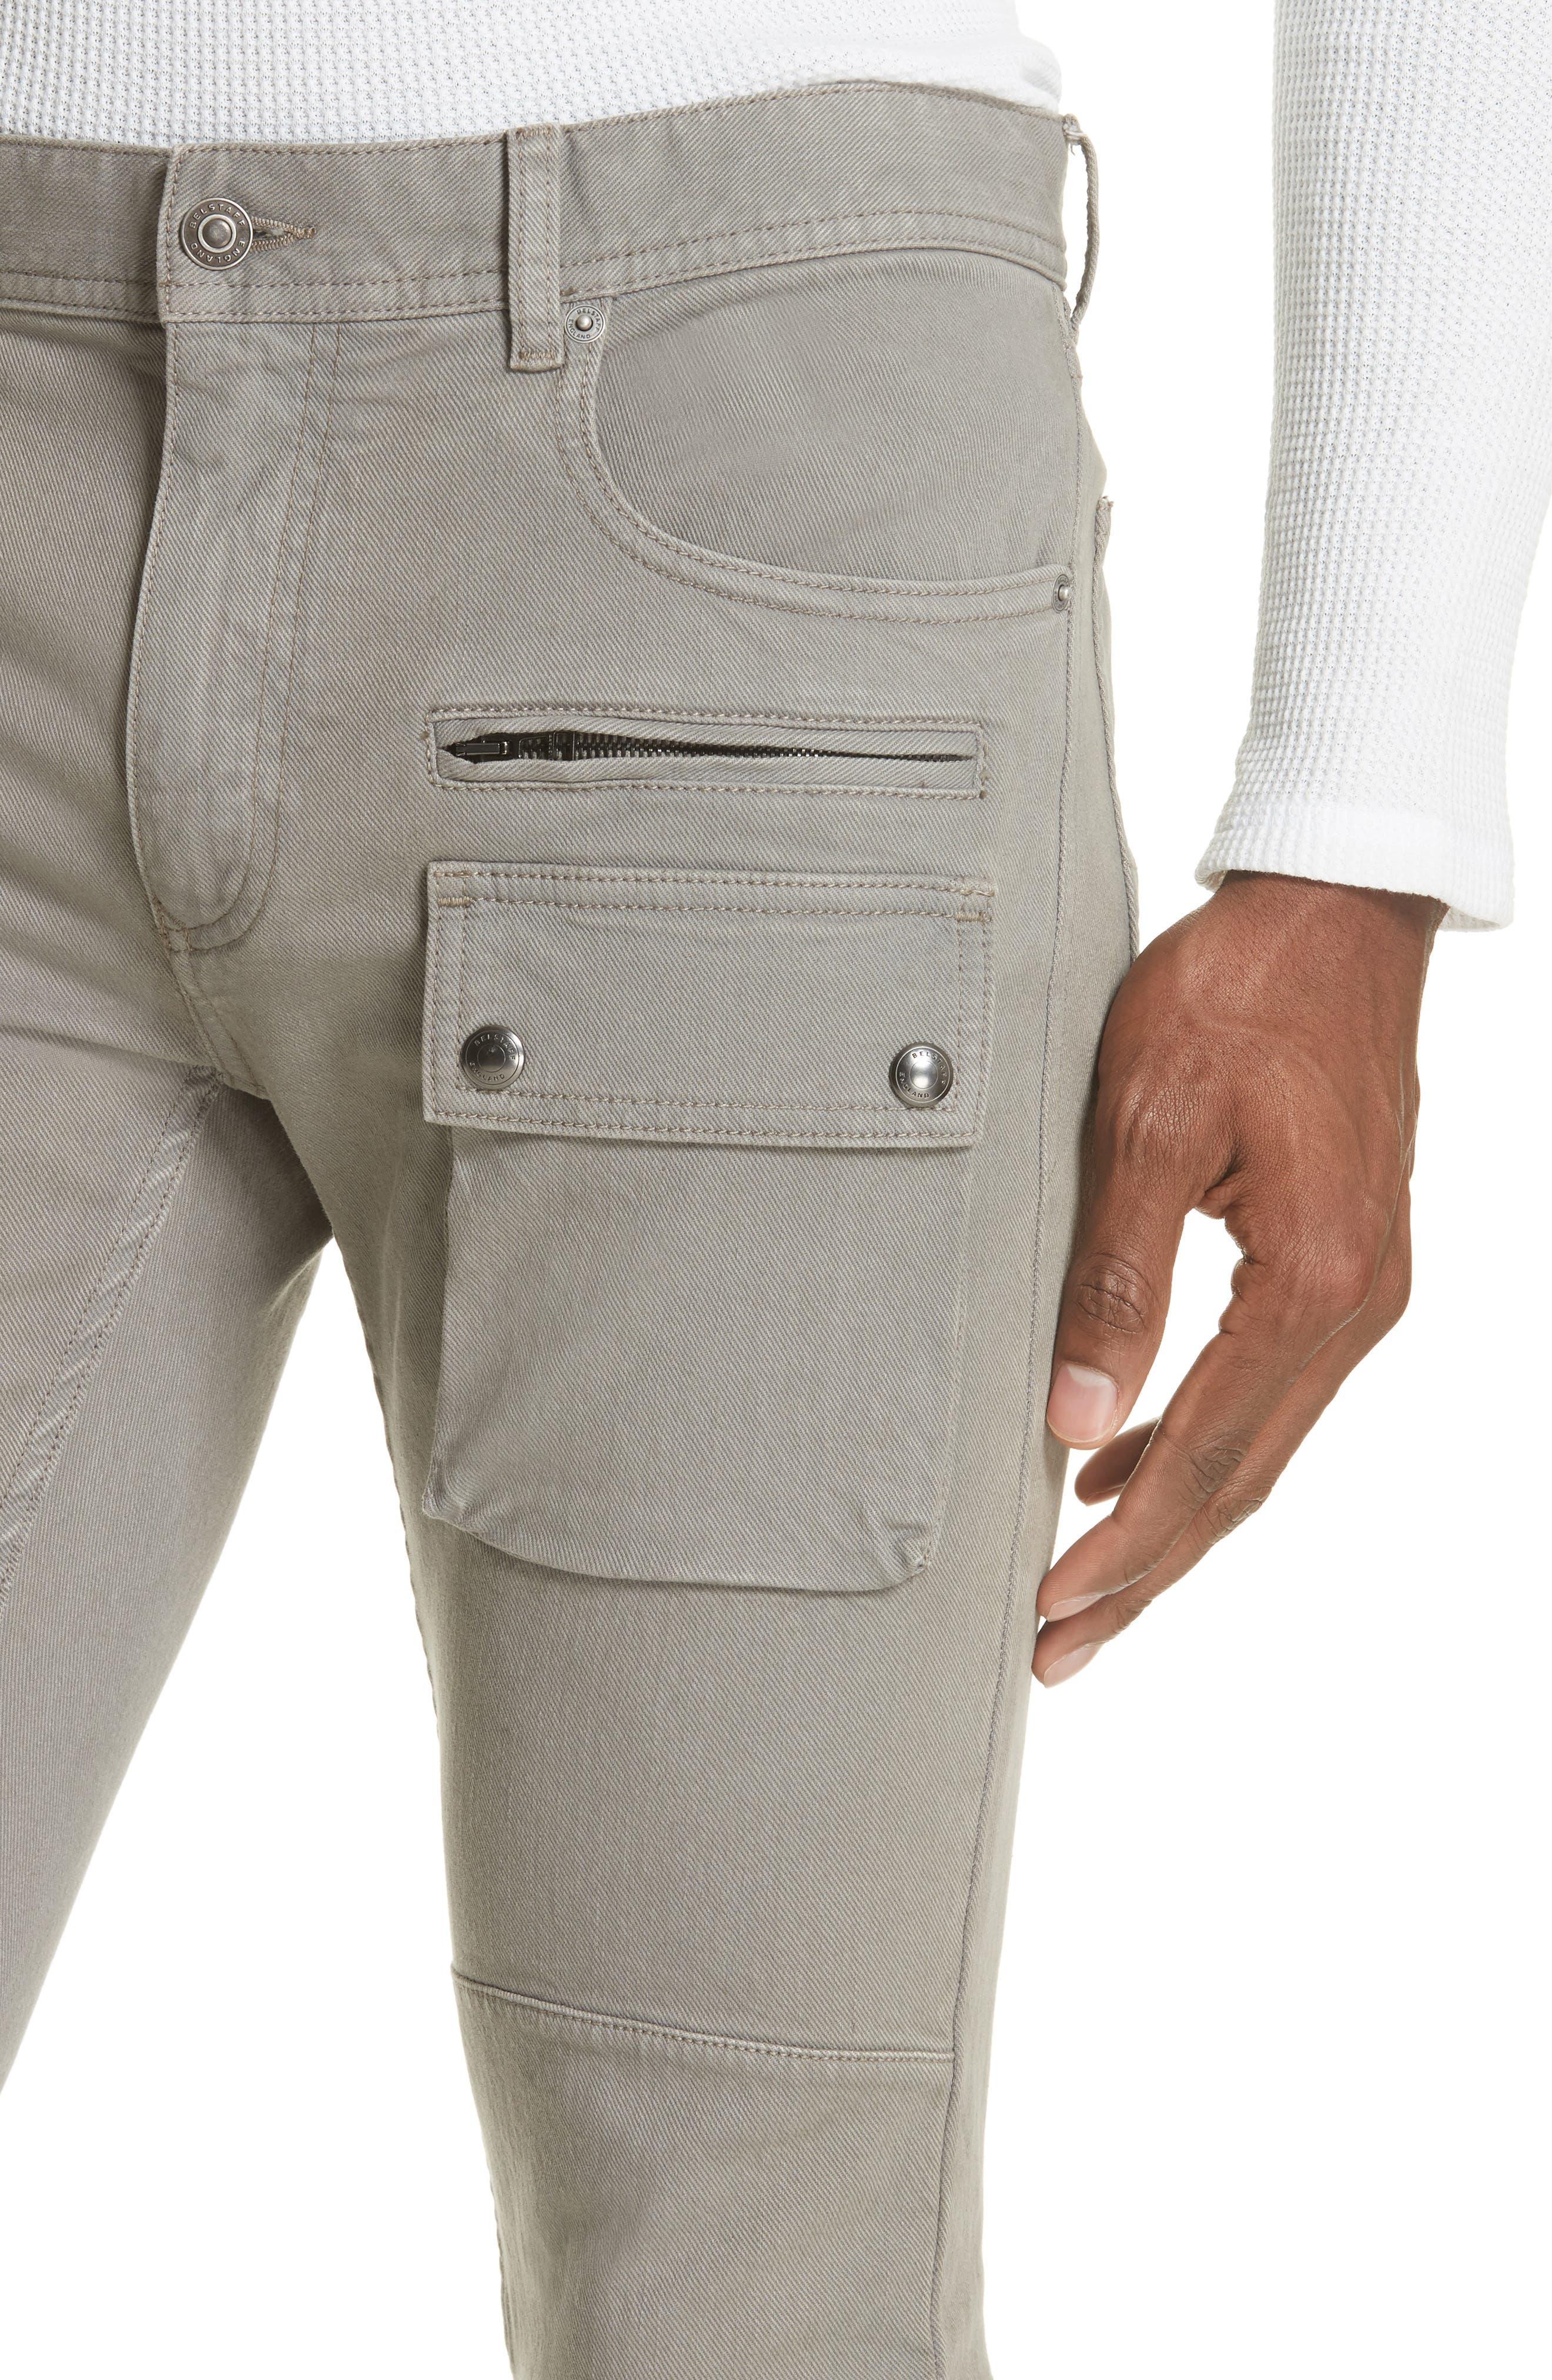 Polmont Cargo Denim Jeans,                             Alternate thumbnail 4, color,                             SMOKE GREY